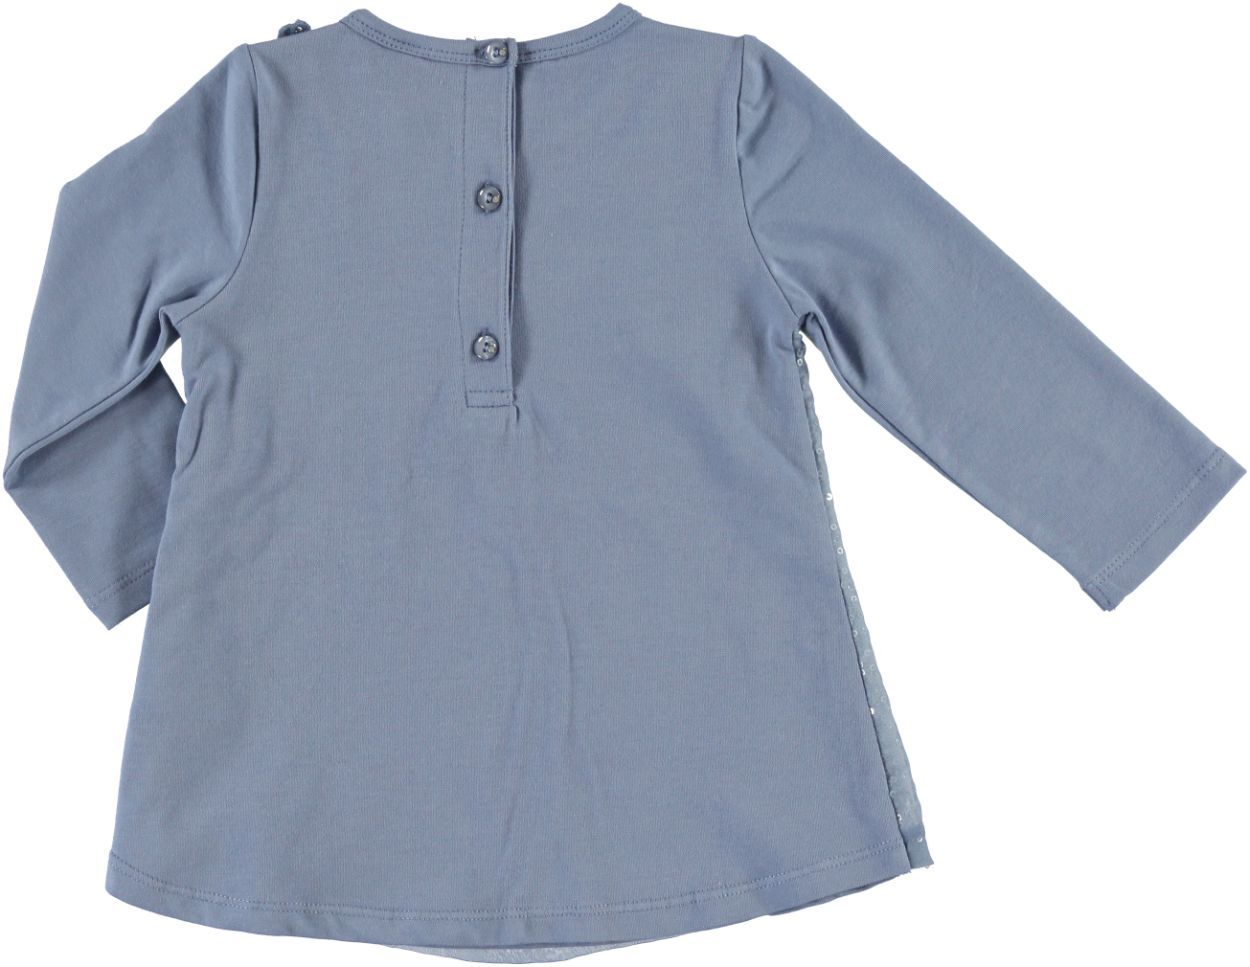 Maxi maglia colore azzurro carta da zucchero per bambina da 6 mesi a